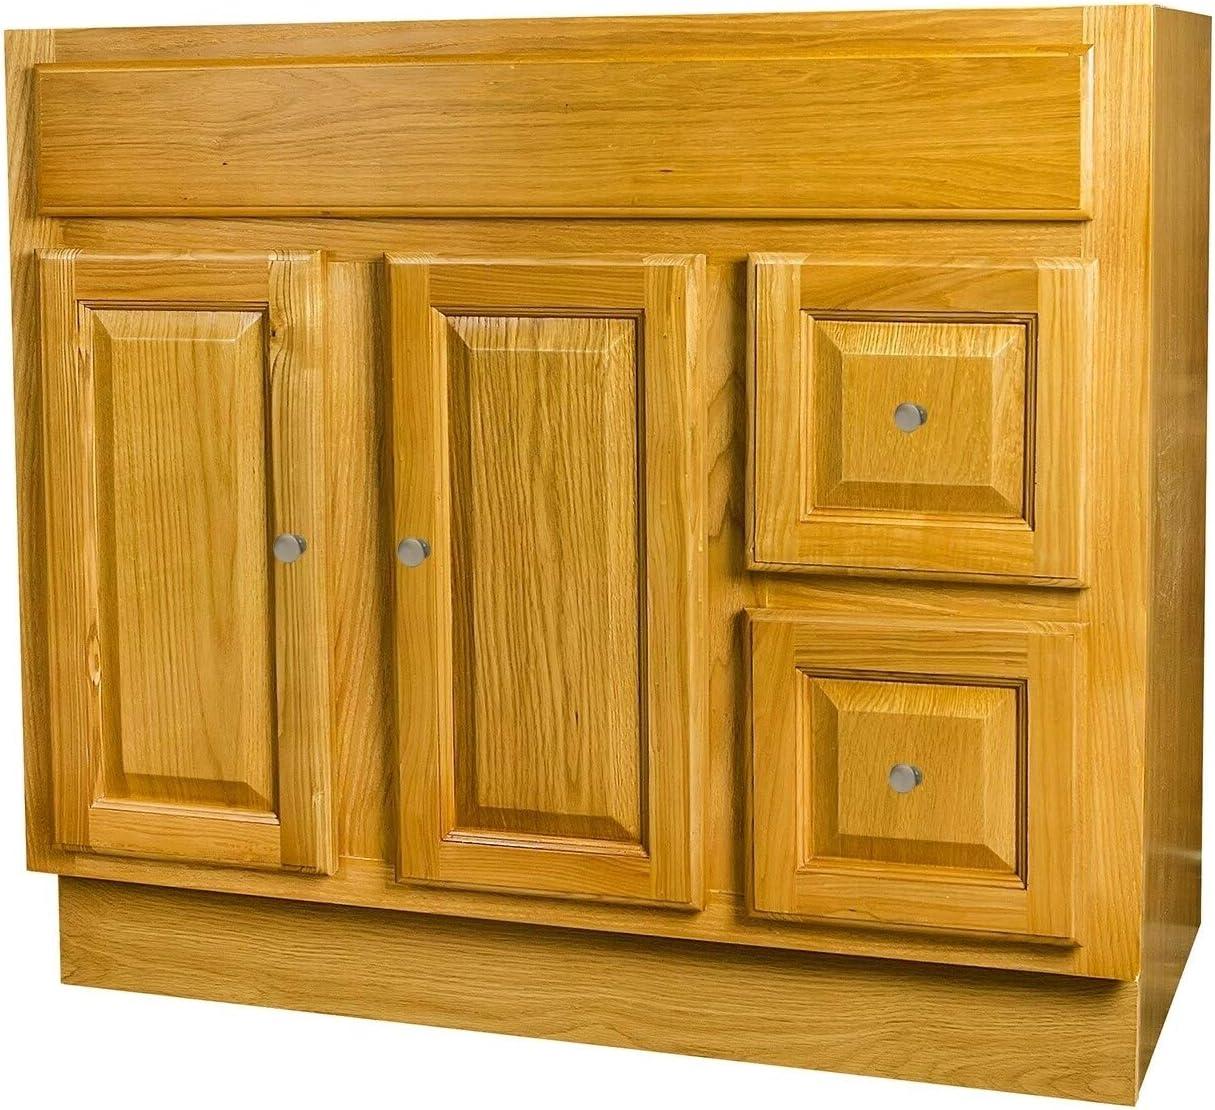 Amazon Com Raised Panel Oak Bathroom Vanity 36x18 Wood Stained Kitchen Dining